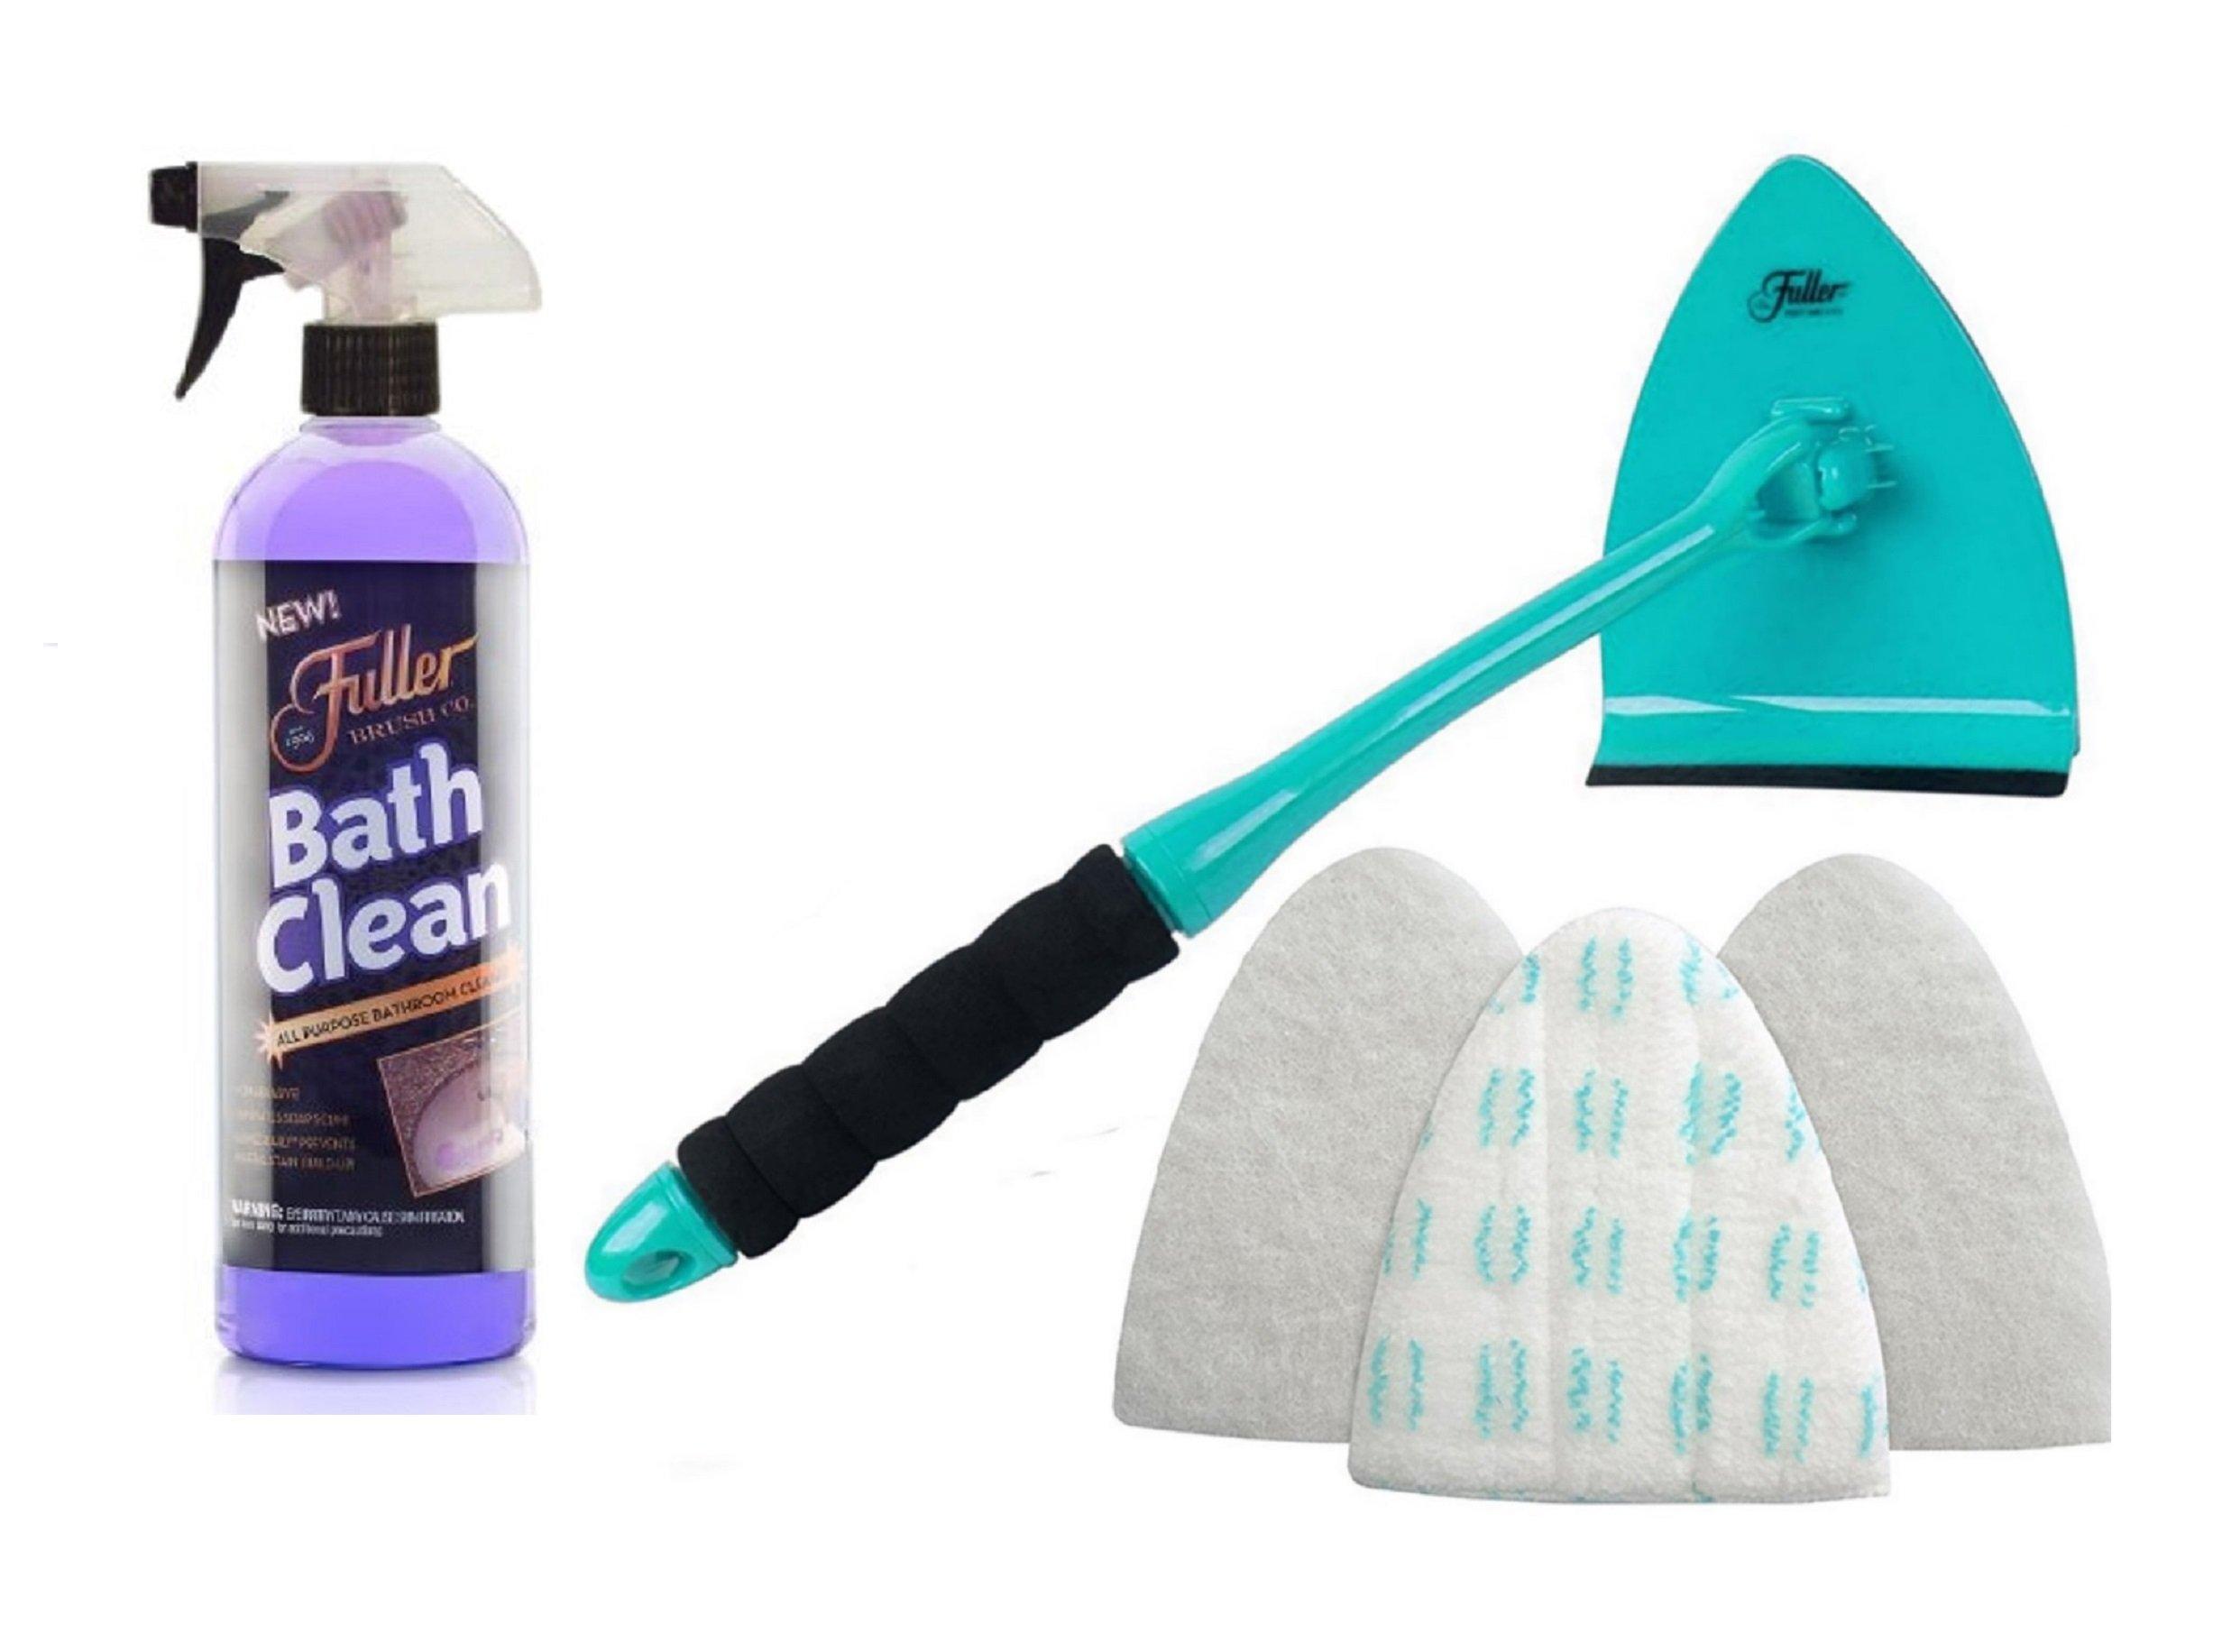 Fuller Brush BathClean Tile and Bathroom Scrubbing Kit with Big EZ Bath Scrubber & Squeege